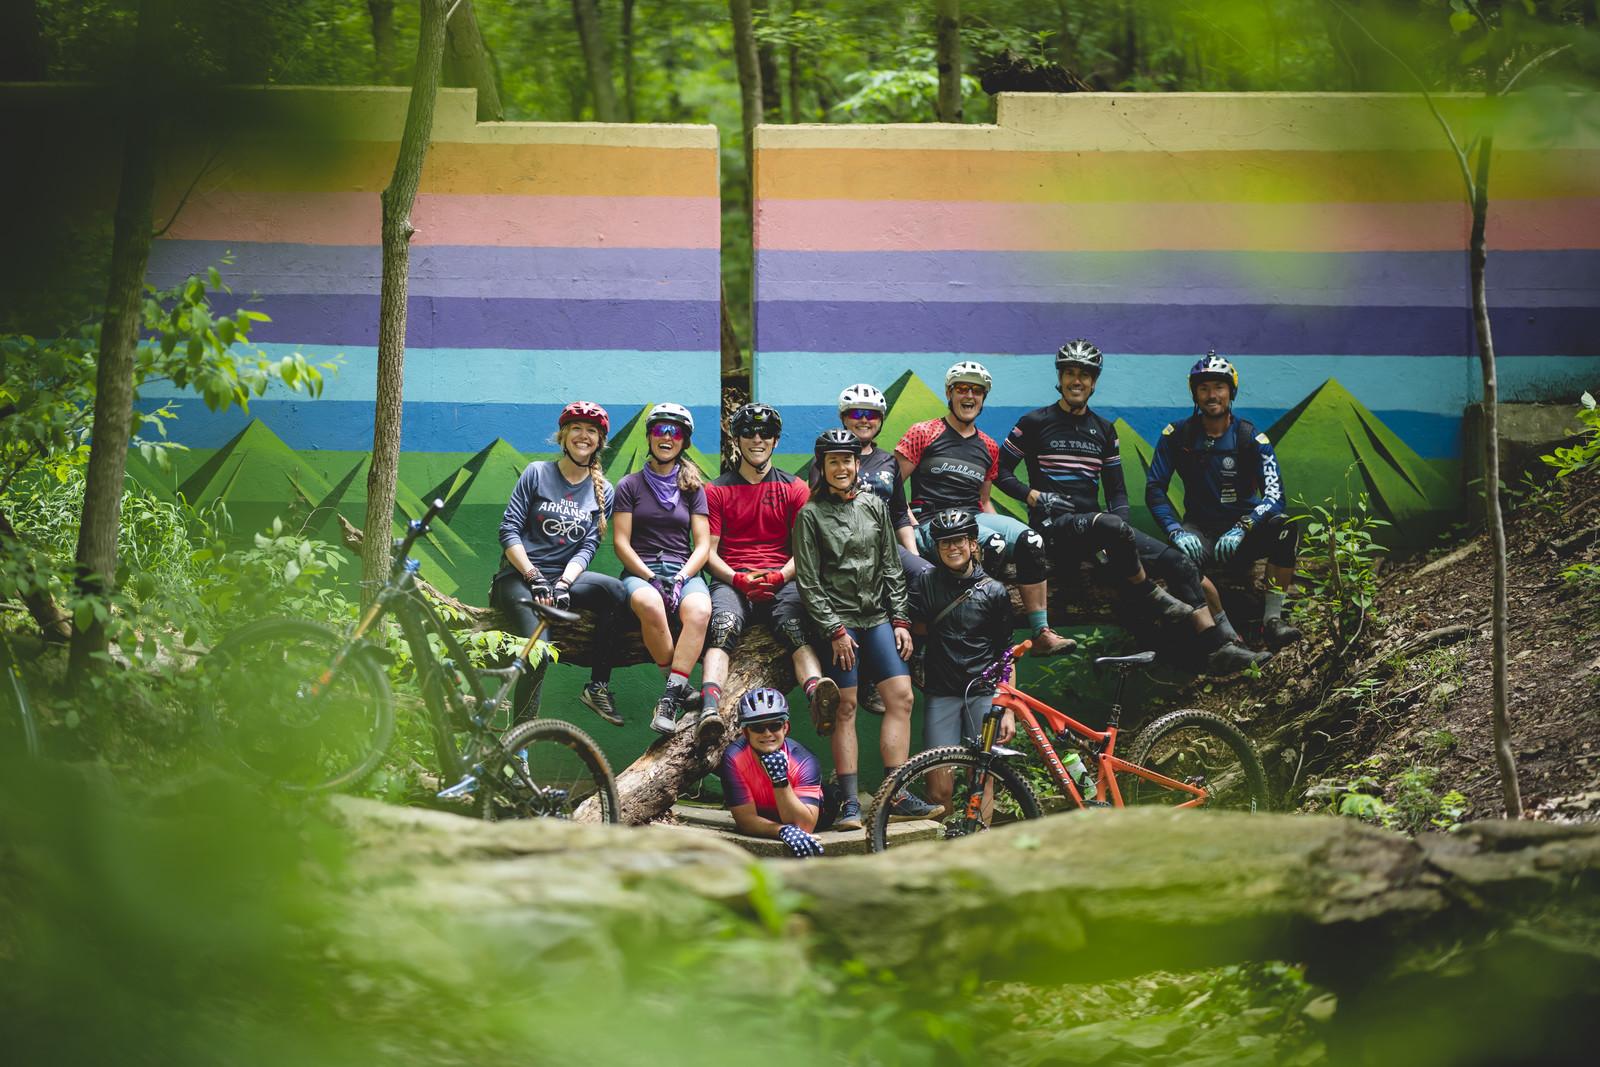 INAUGURAL WOMEN SHRED CYCLING FESTIVAL MAKES ITS MARK